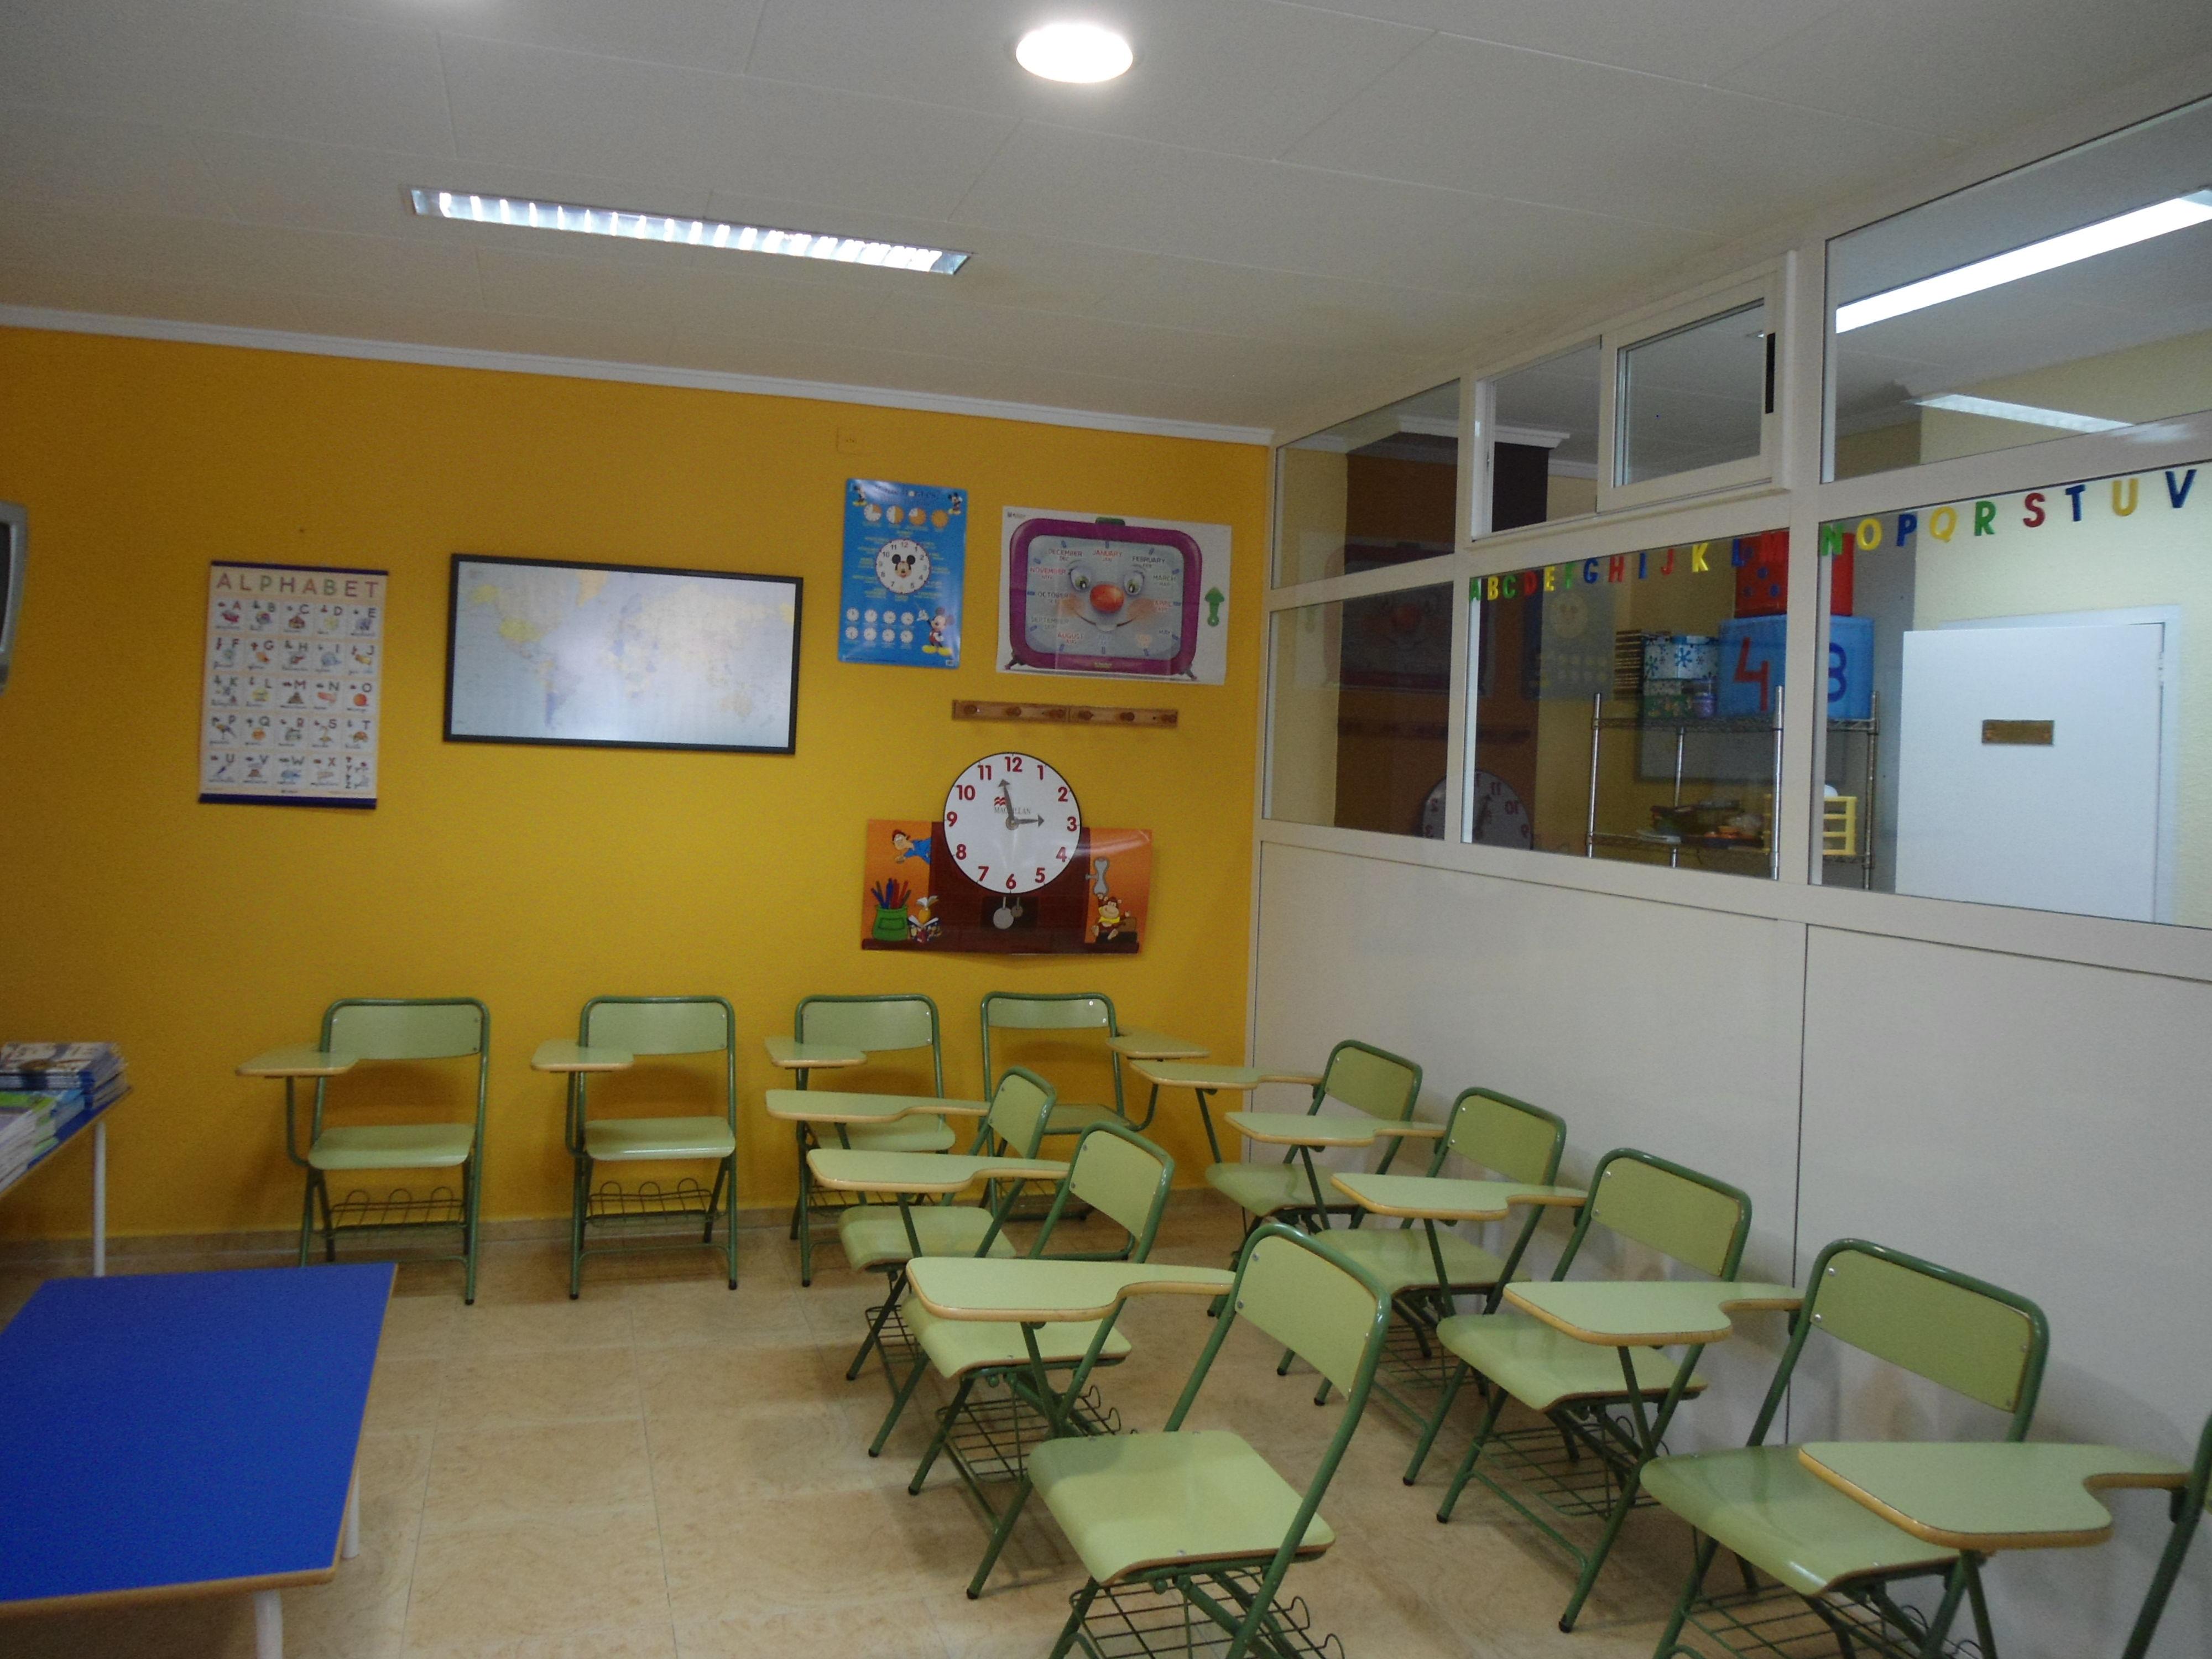 Foto 19 de Academias de idiomas en Moncada | Centre d'Estudis Etnies